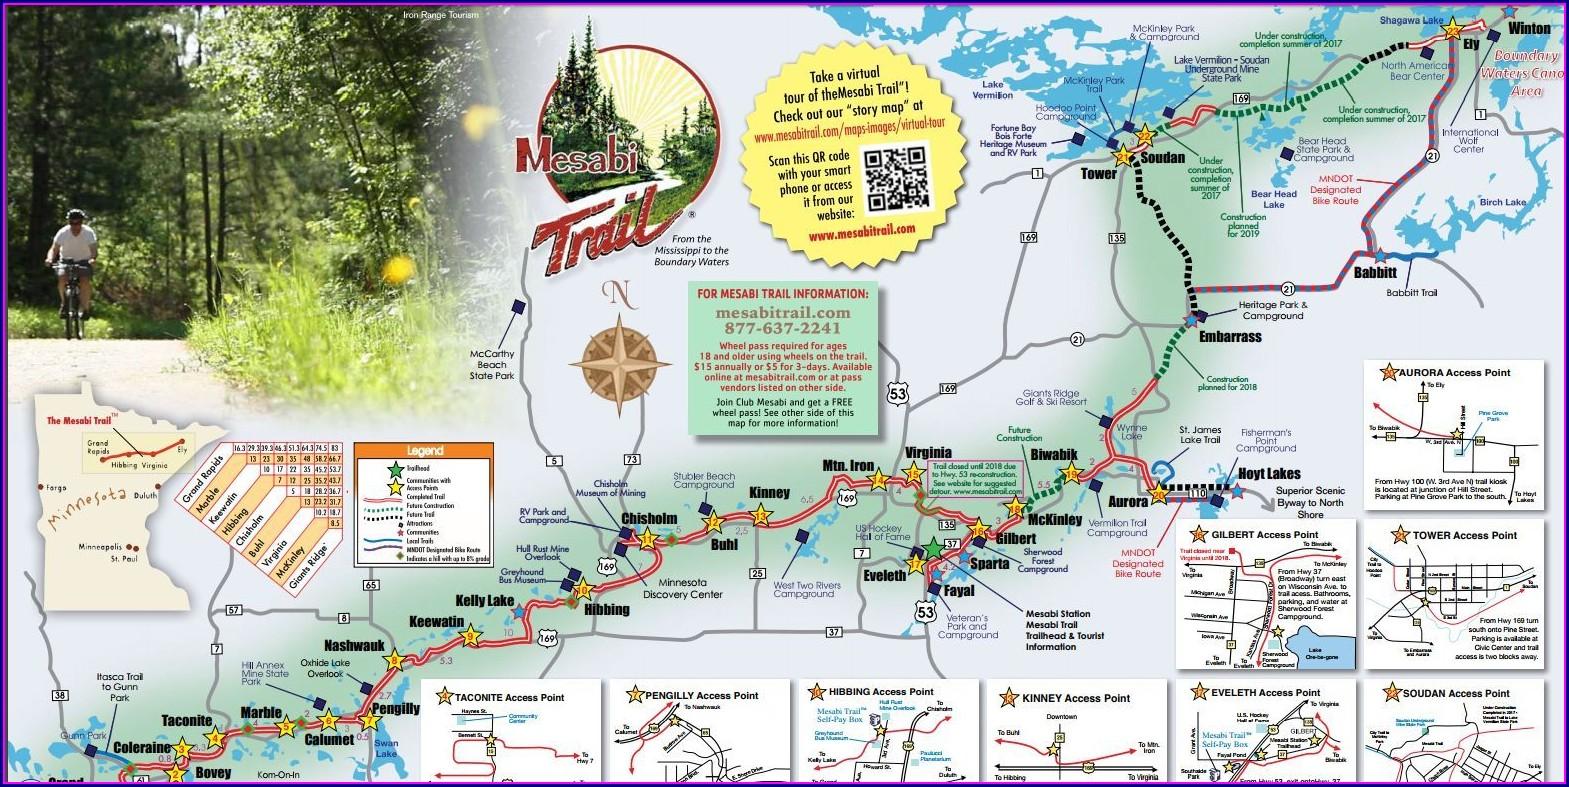 Bike Trail Mesabi Trail Map